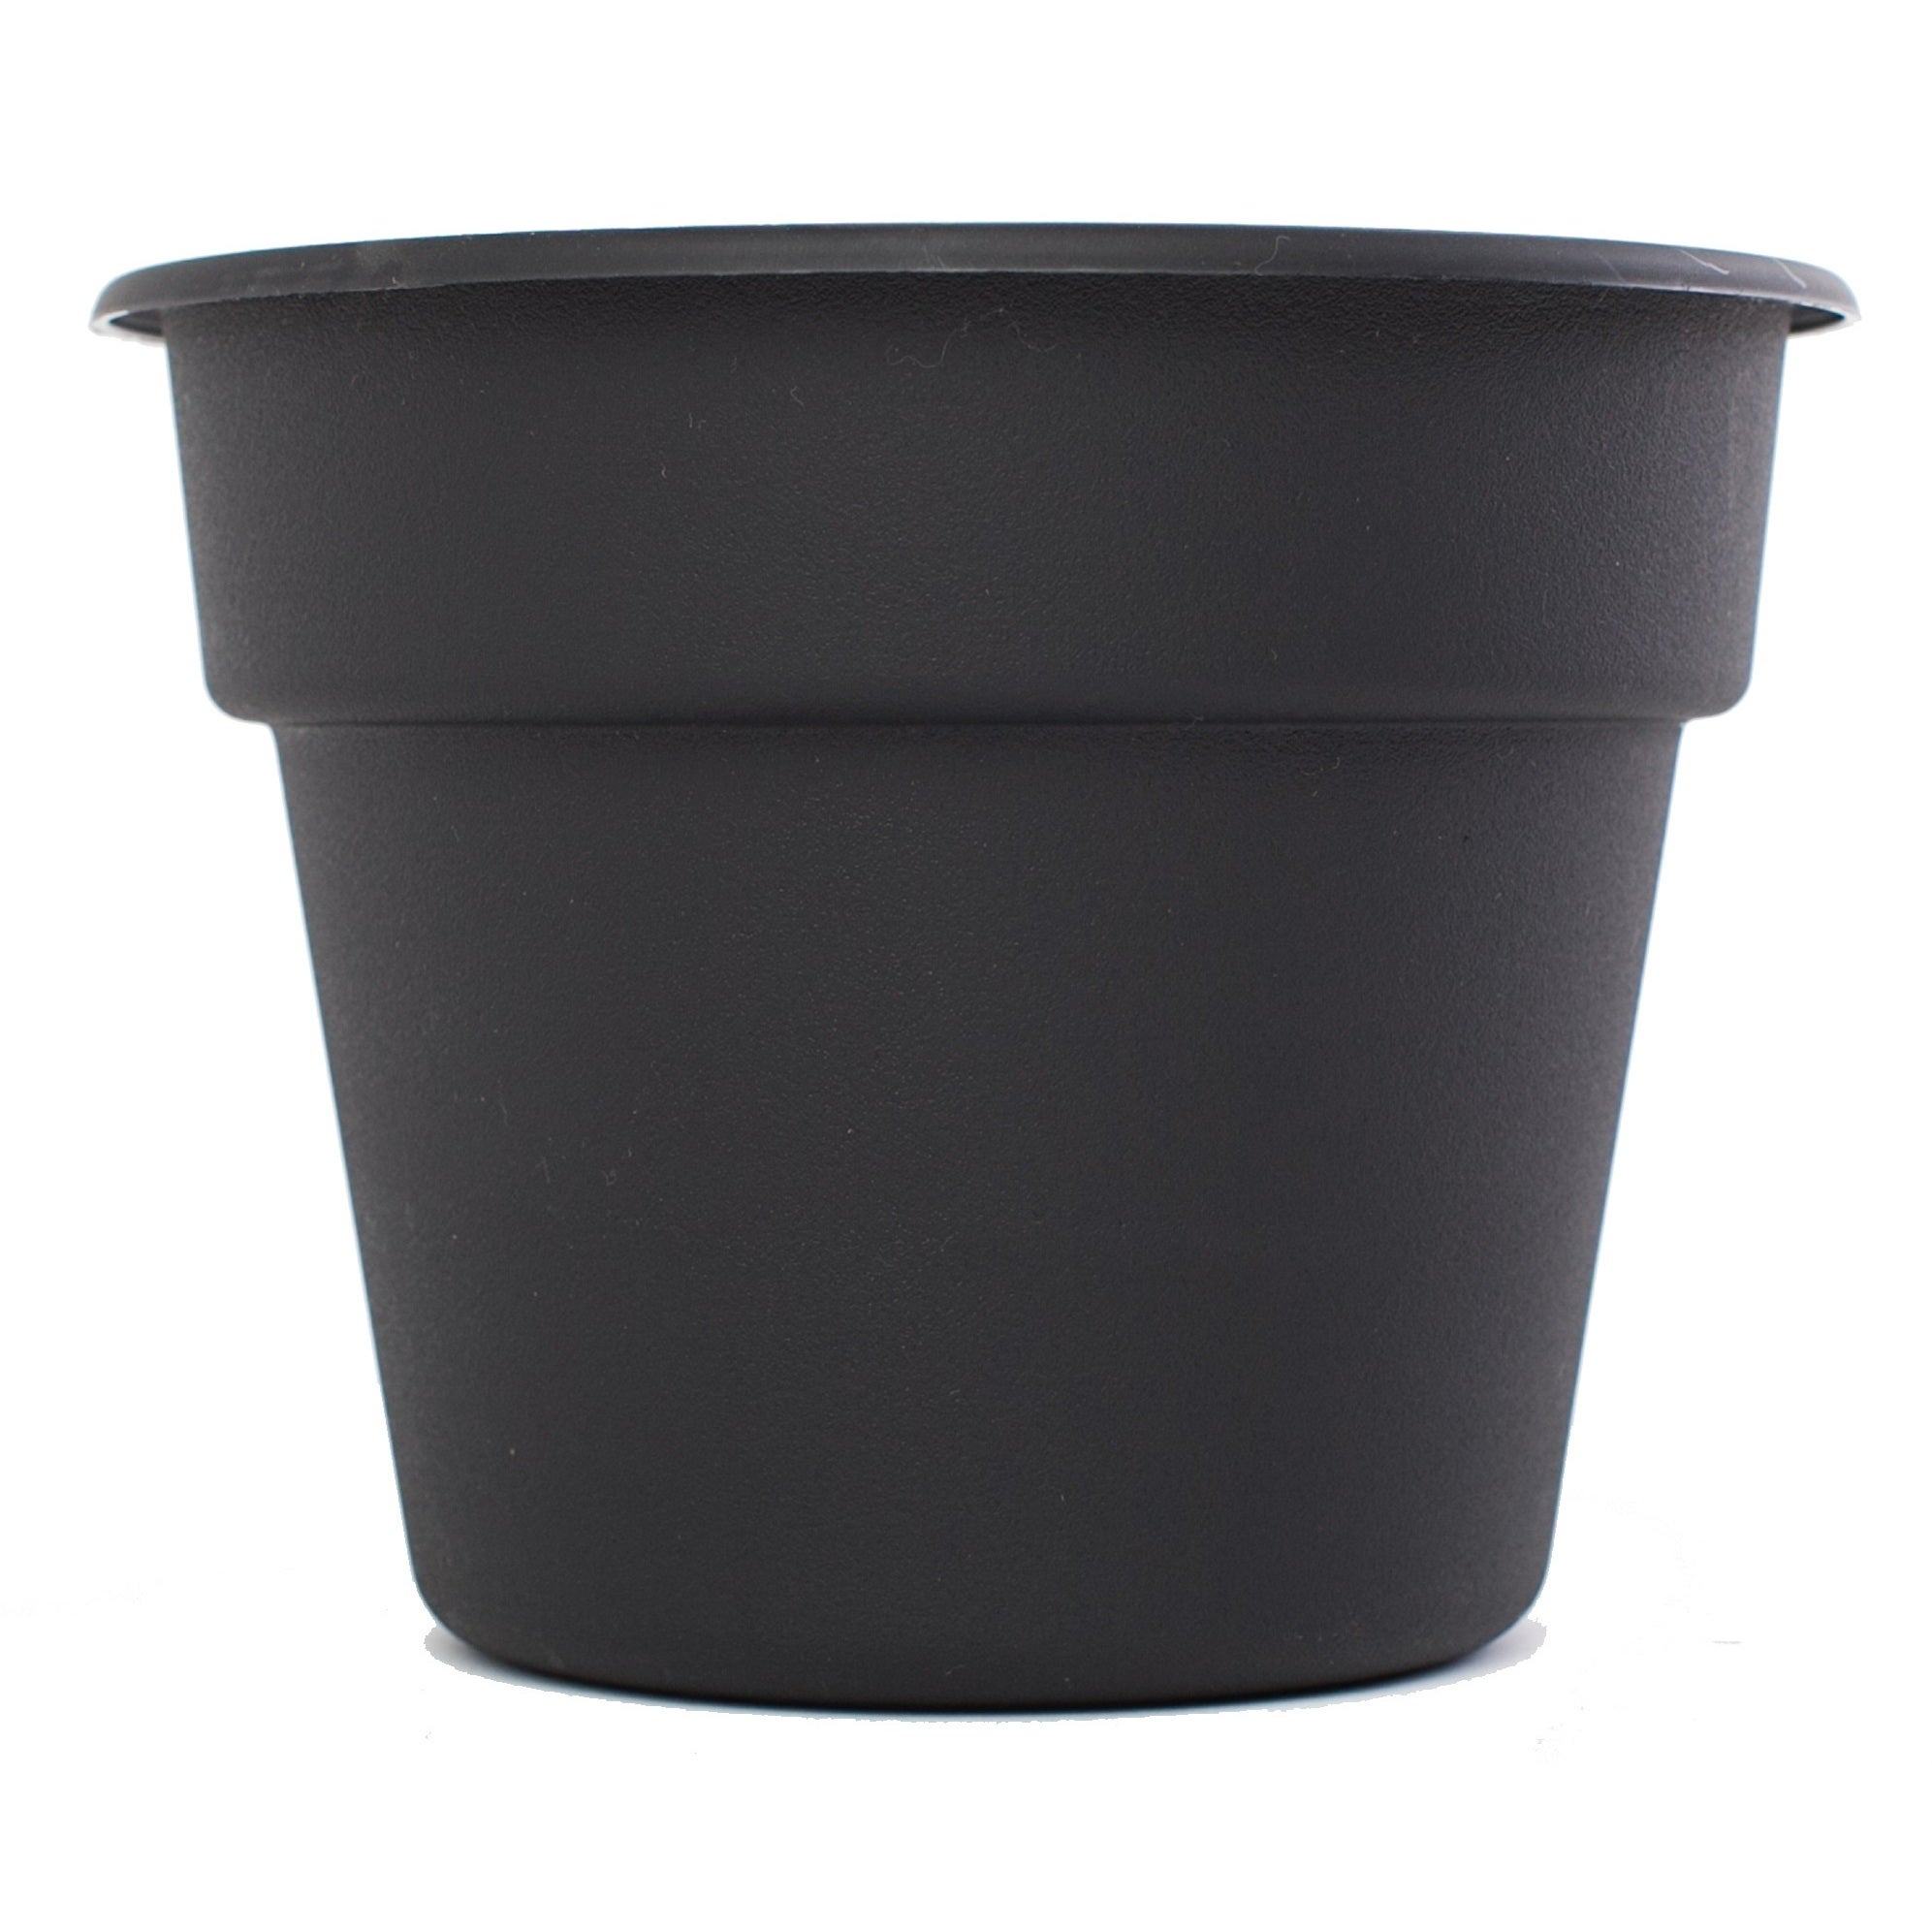 Bloem Dura Cotta Black Saucer 4